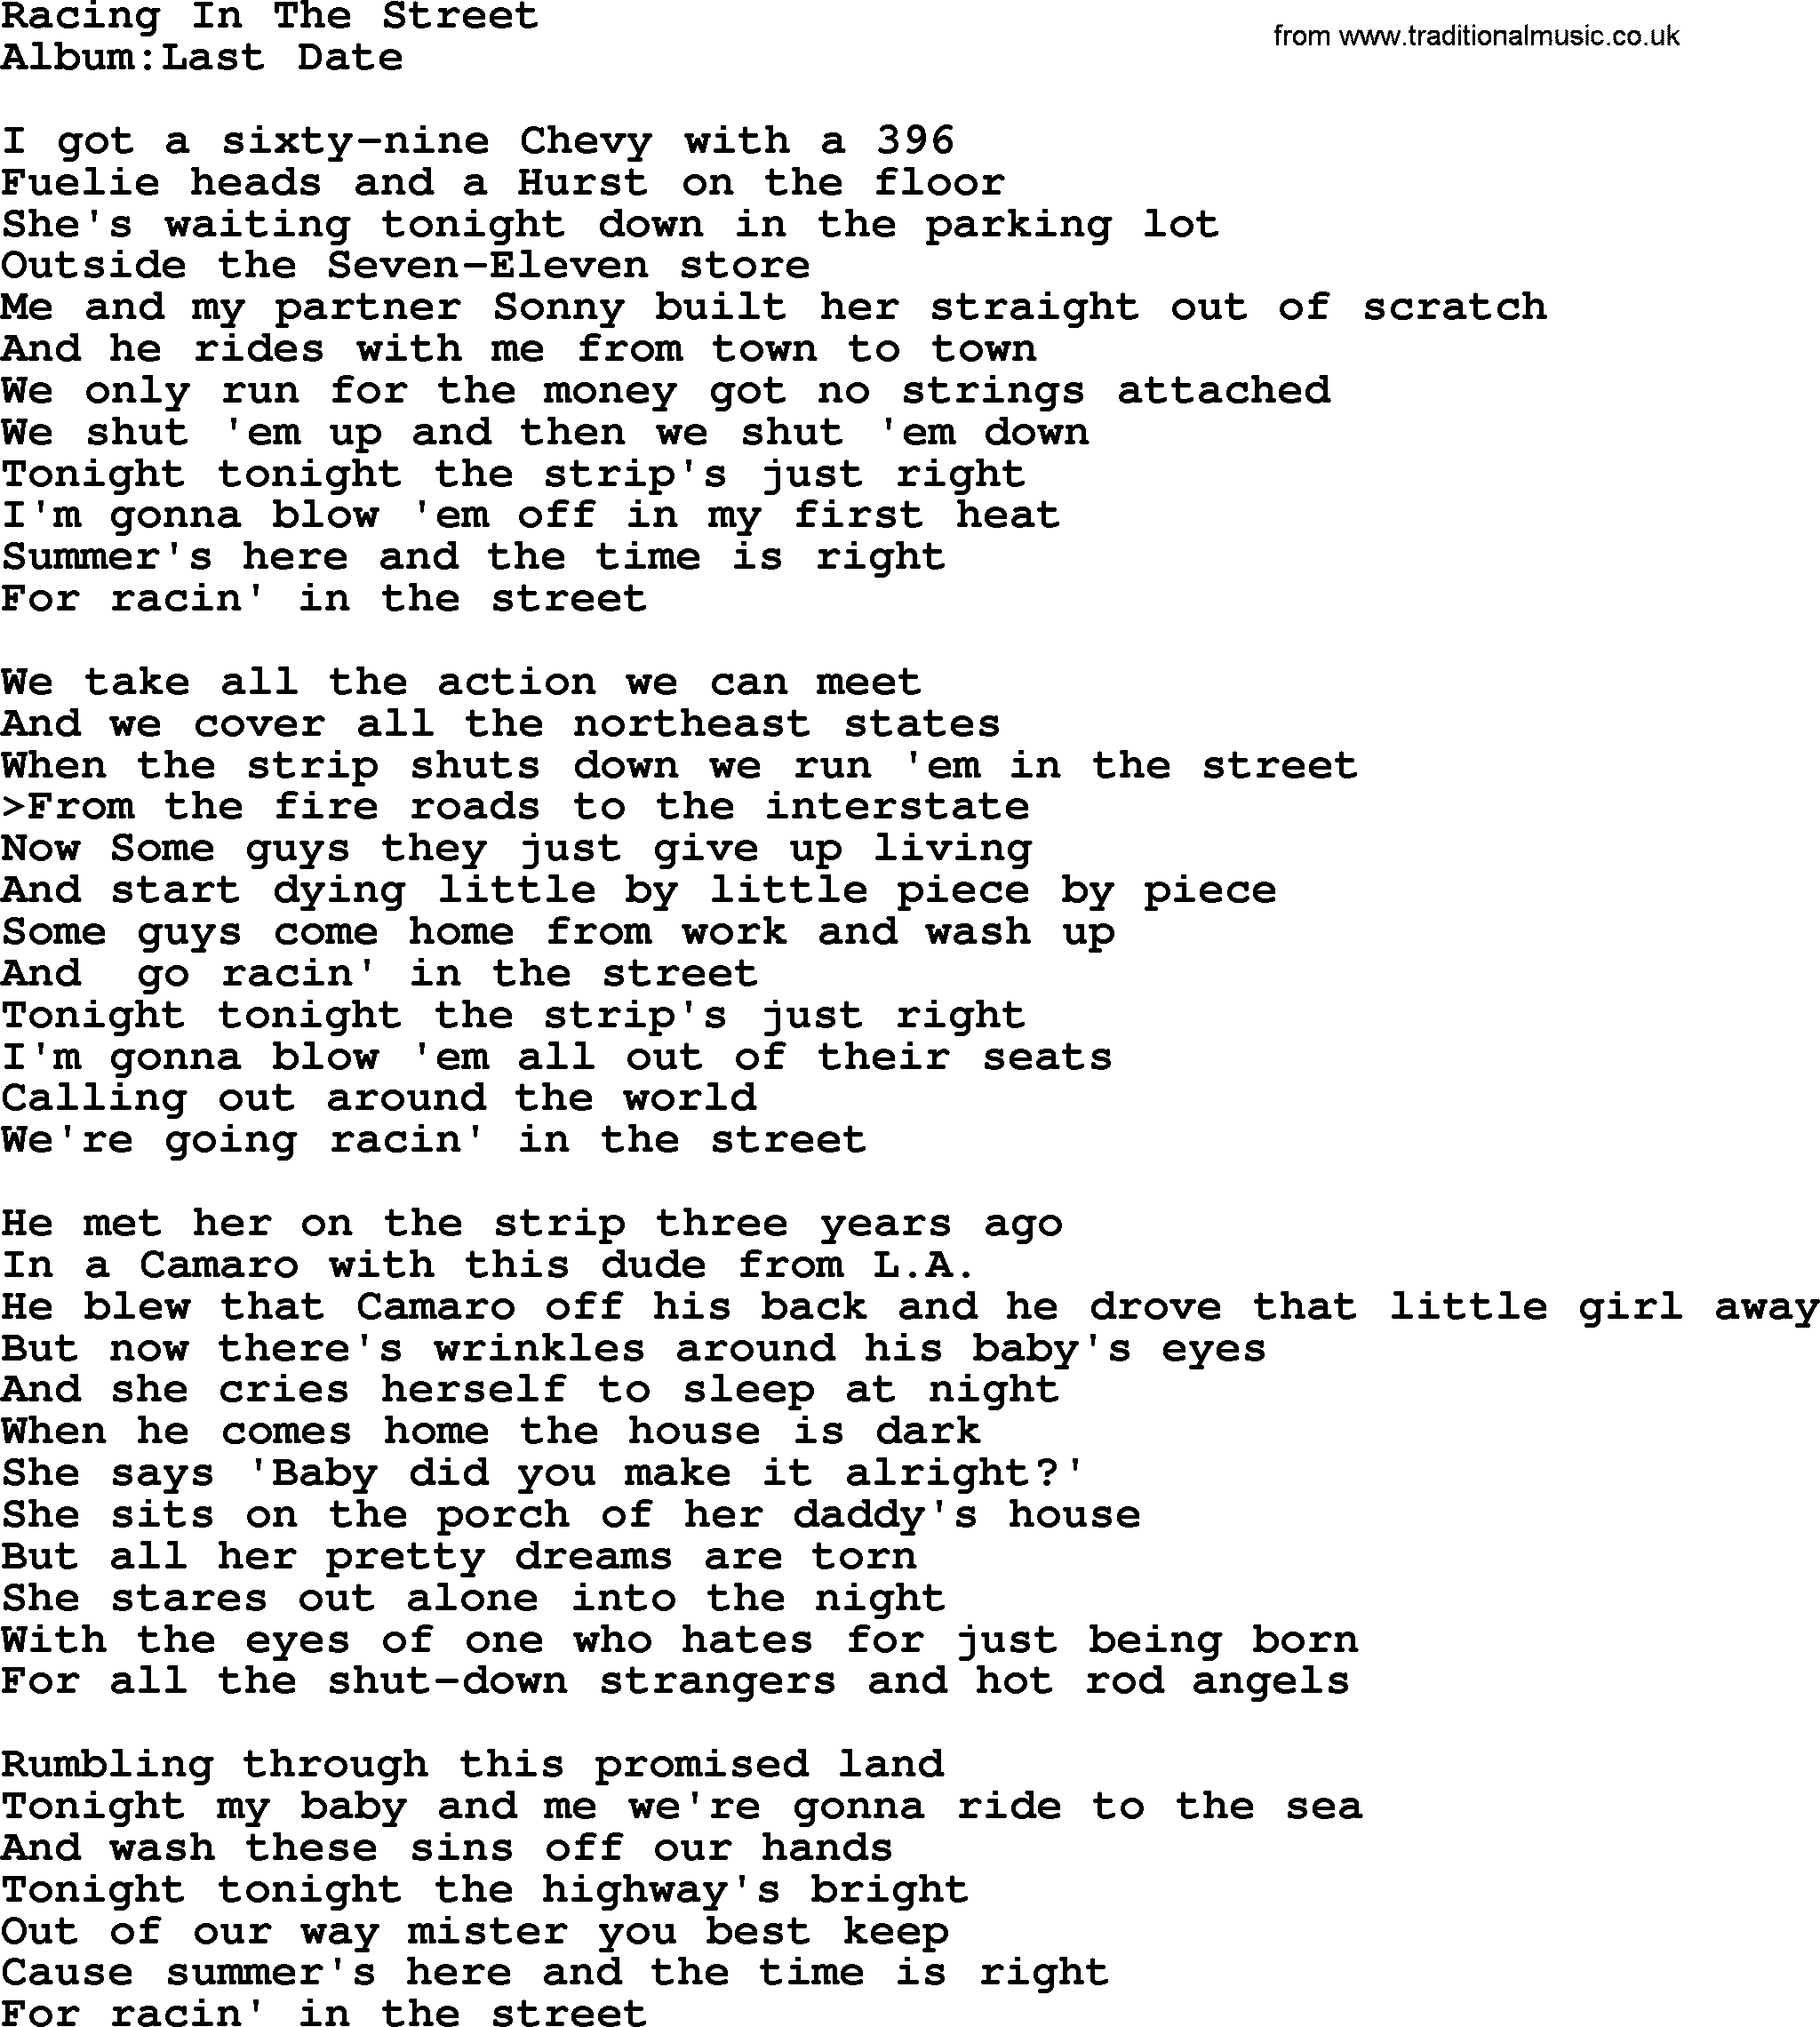 Emmylou Harris song: Racing In The Street, lyrics